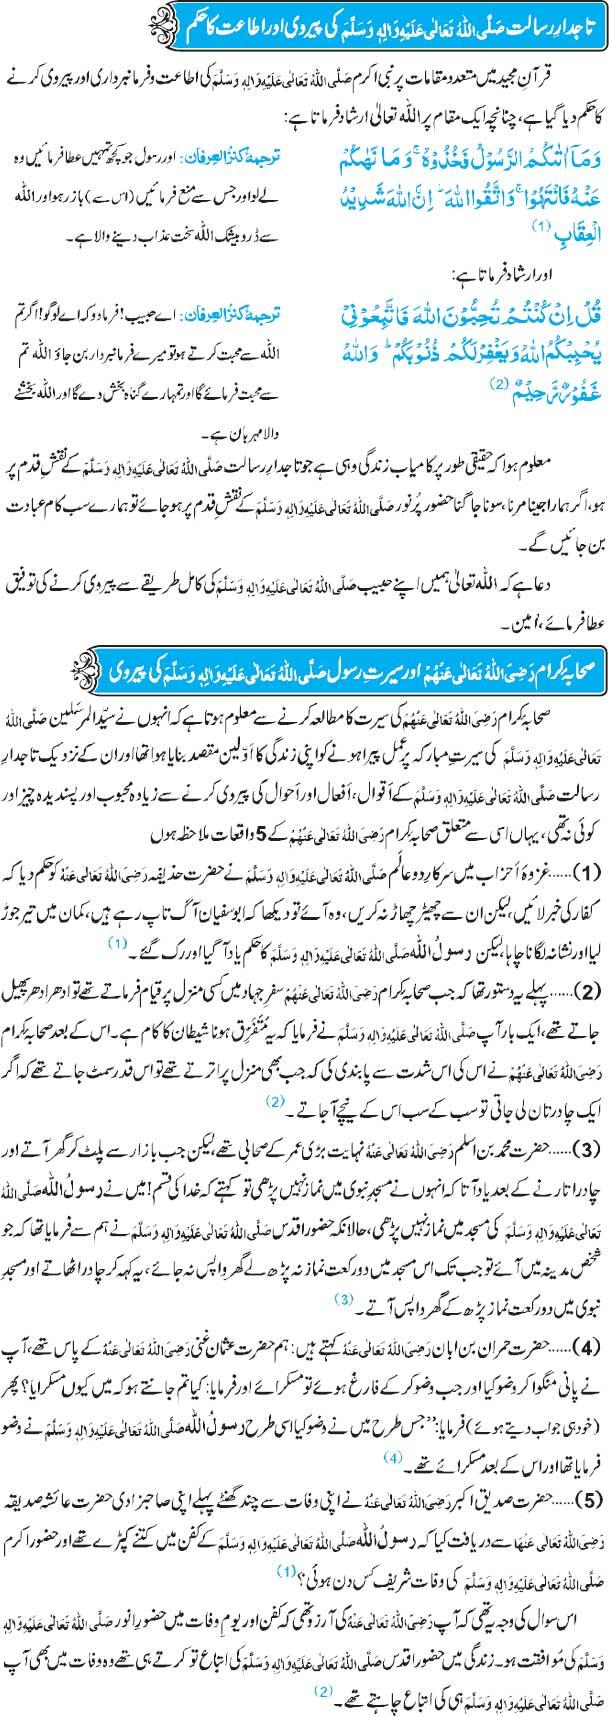 Tajdar e Risalat (PBUH) Ki Pairwi Aur Itaat